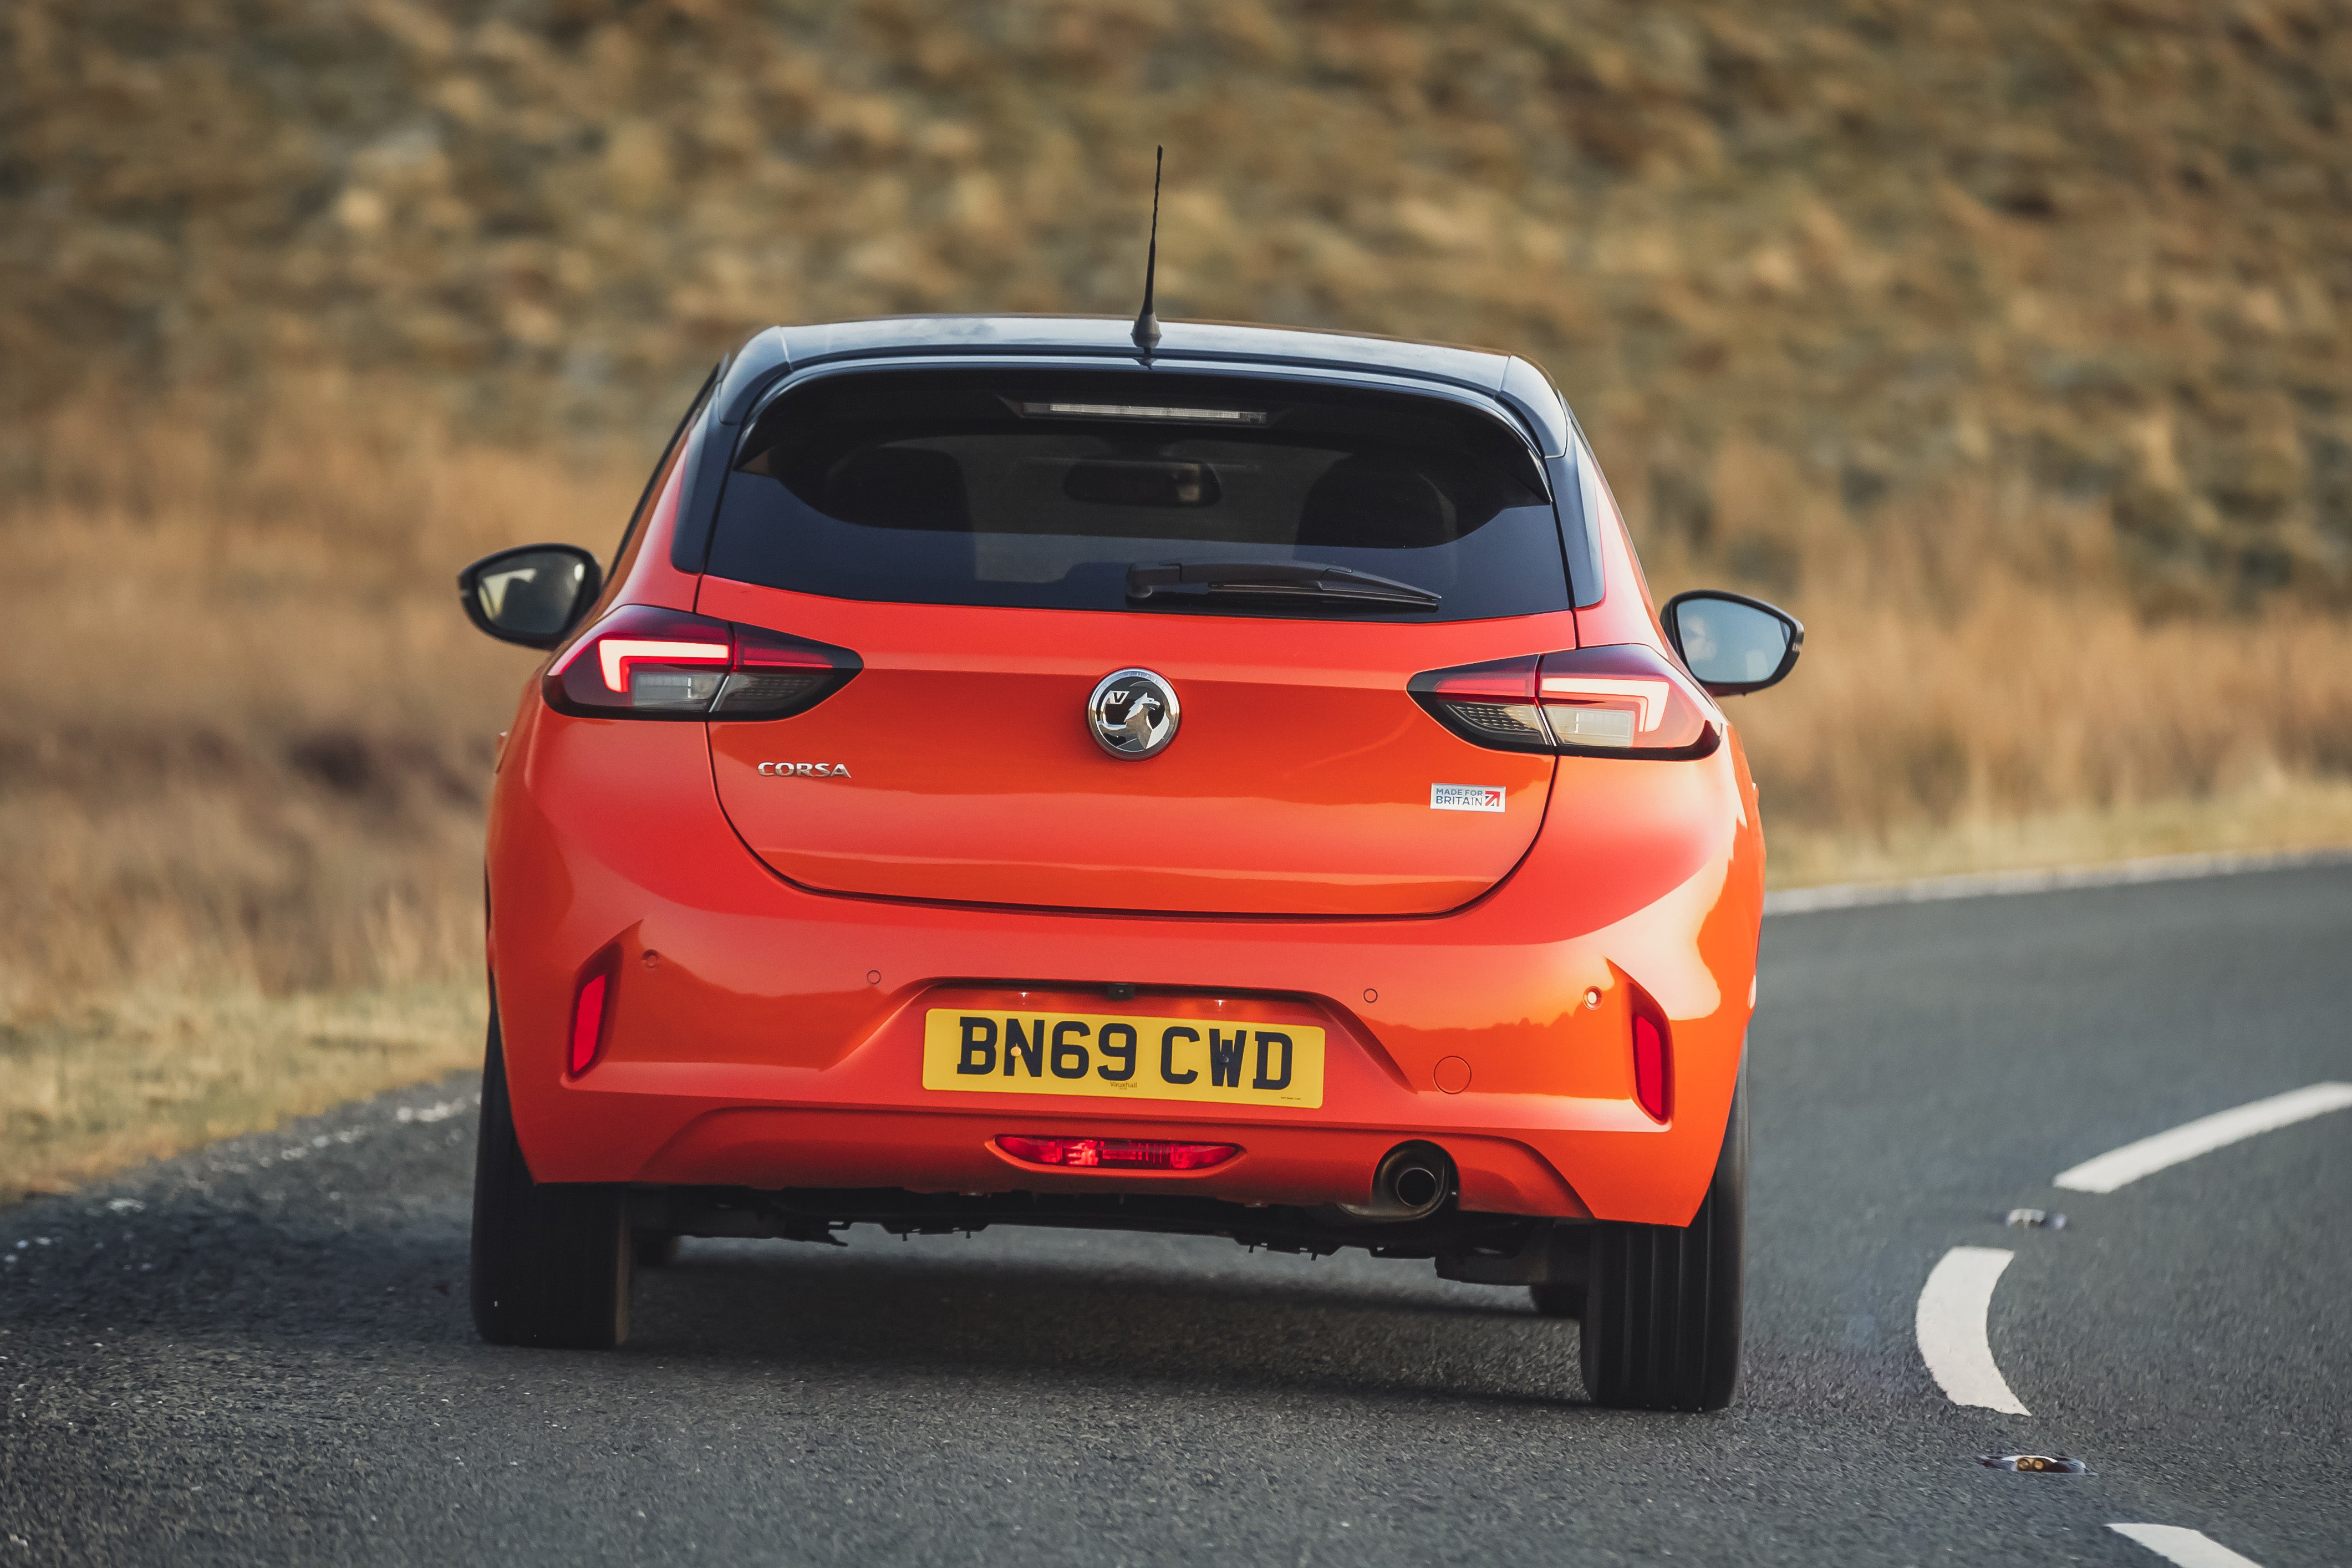 Vauxhall Corsa Rear View